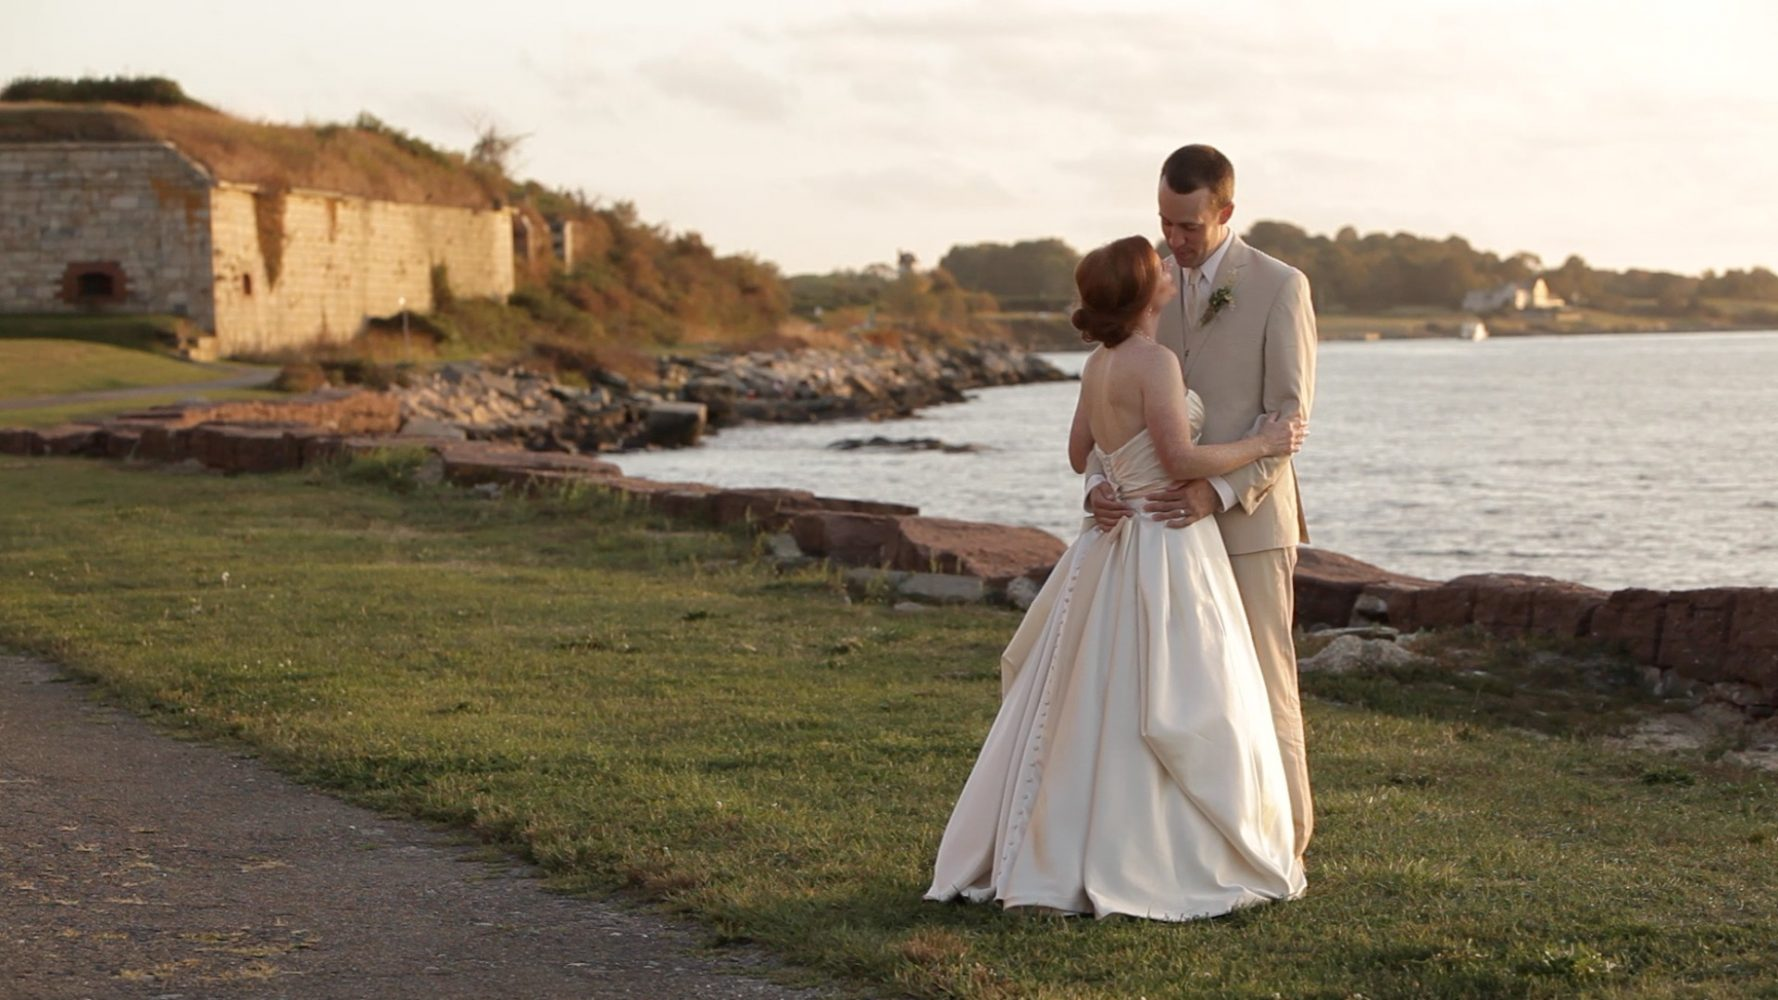 Grace + Collin | Newport, Rhode Island